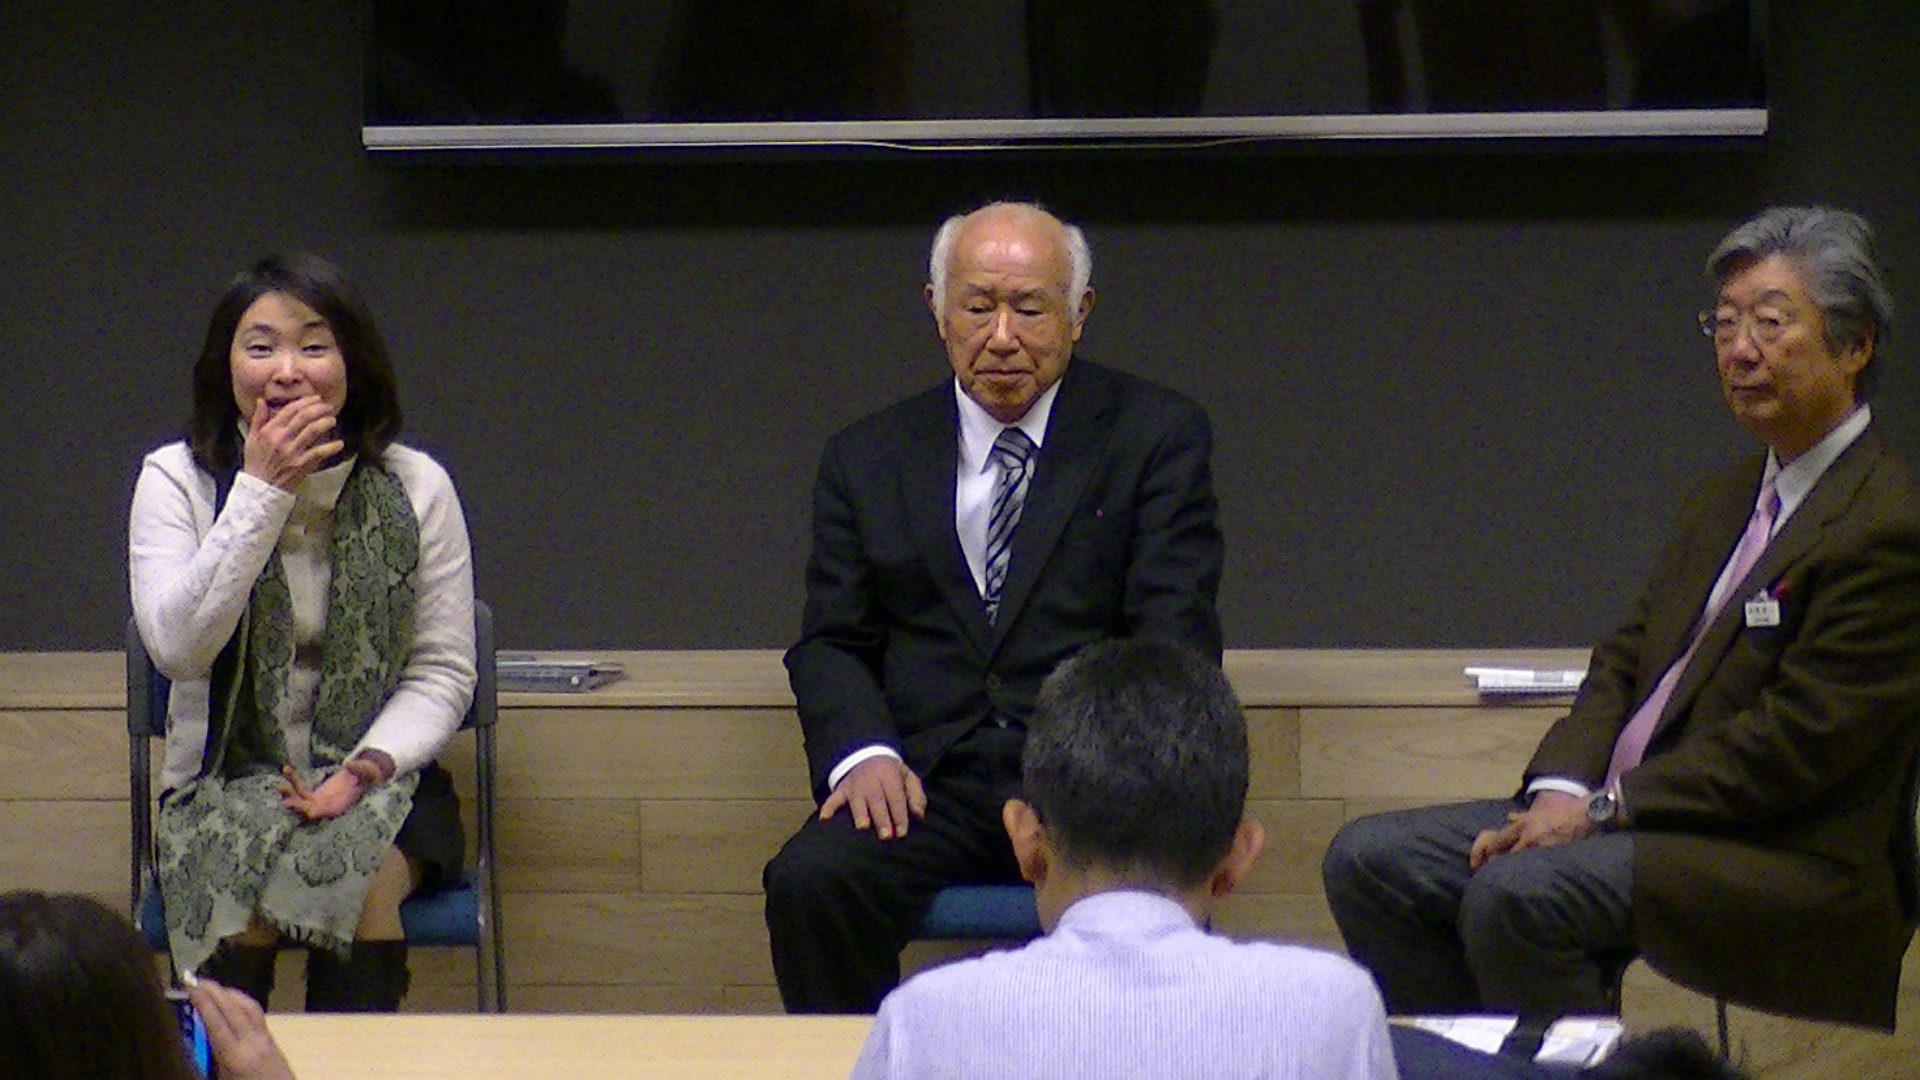 PIC 0549 - 4月1日東京思風塾の開催になります。